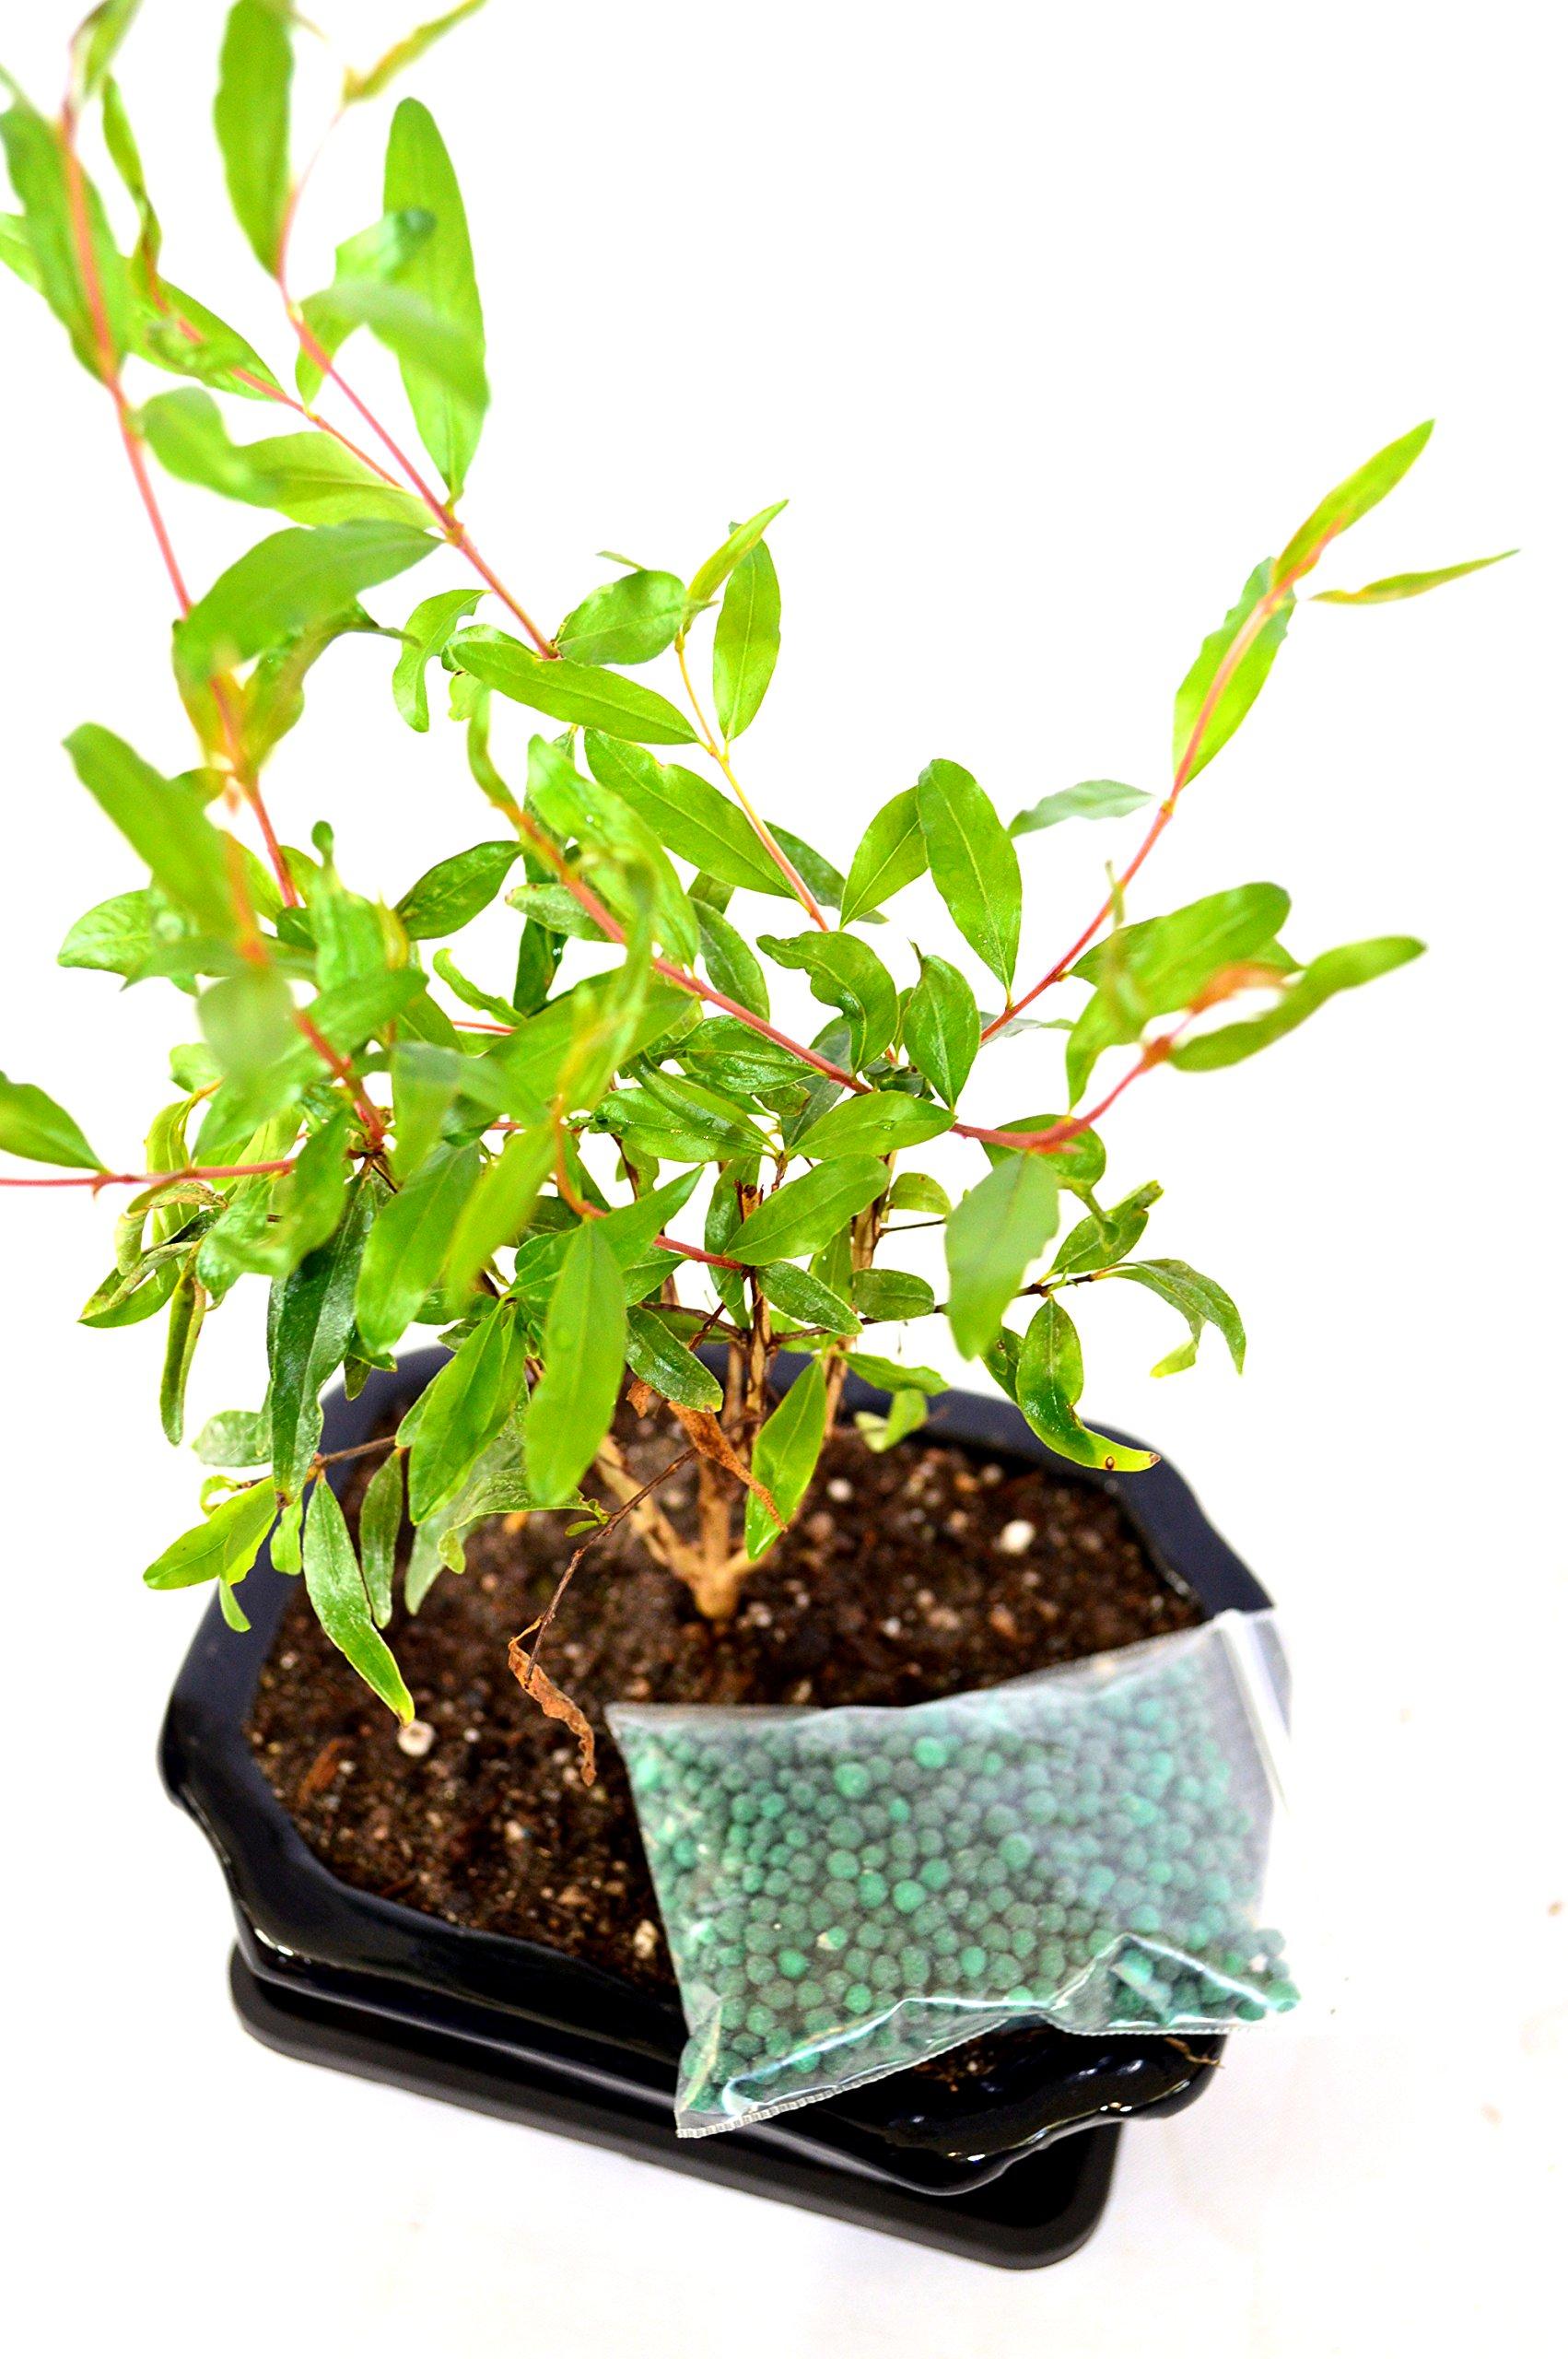 9GreenBox - Dwarf Pomegranate Mame Bonsai with Ceramic Pot by 9GreenBox.com (Image #2)